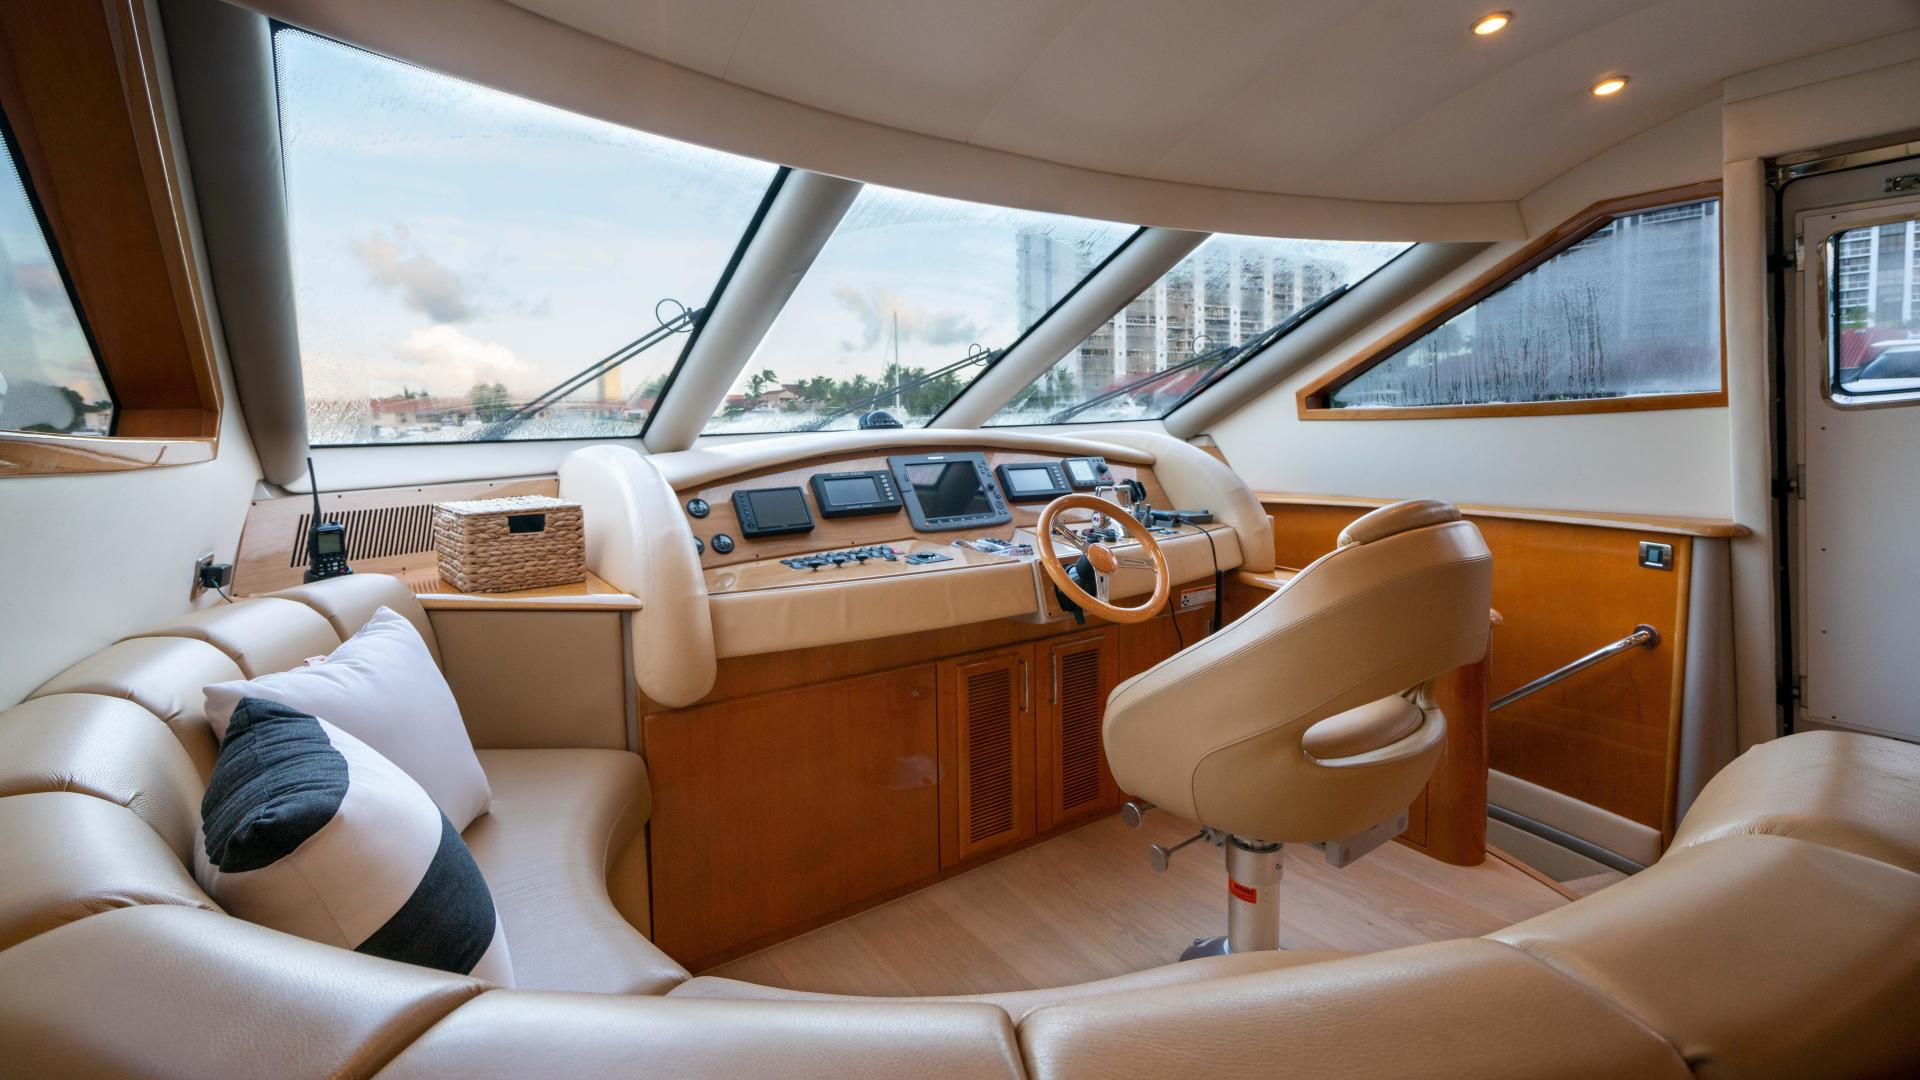 Marquis-690 2007-MINX Aventura-Florida-United States-1492607   Thumbnail